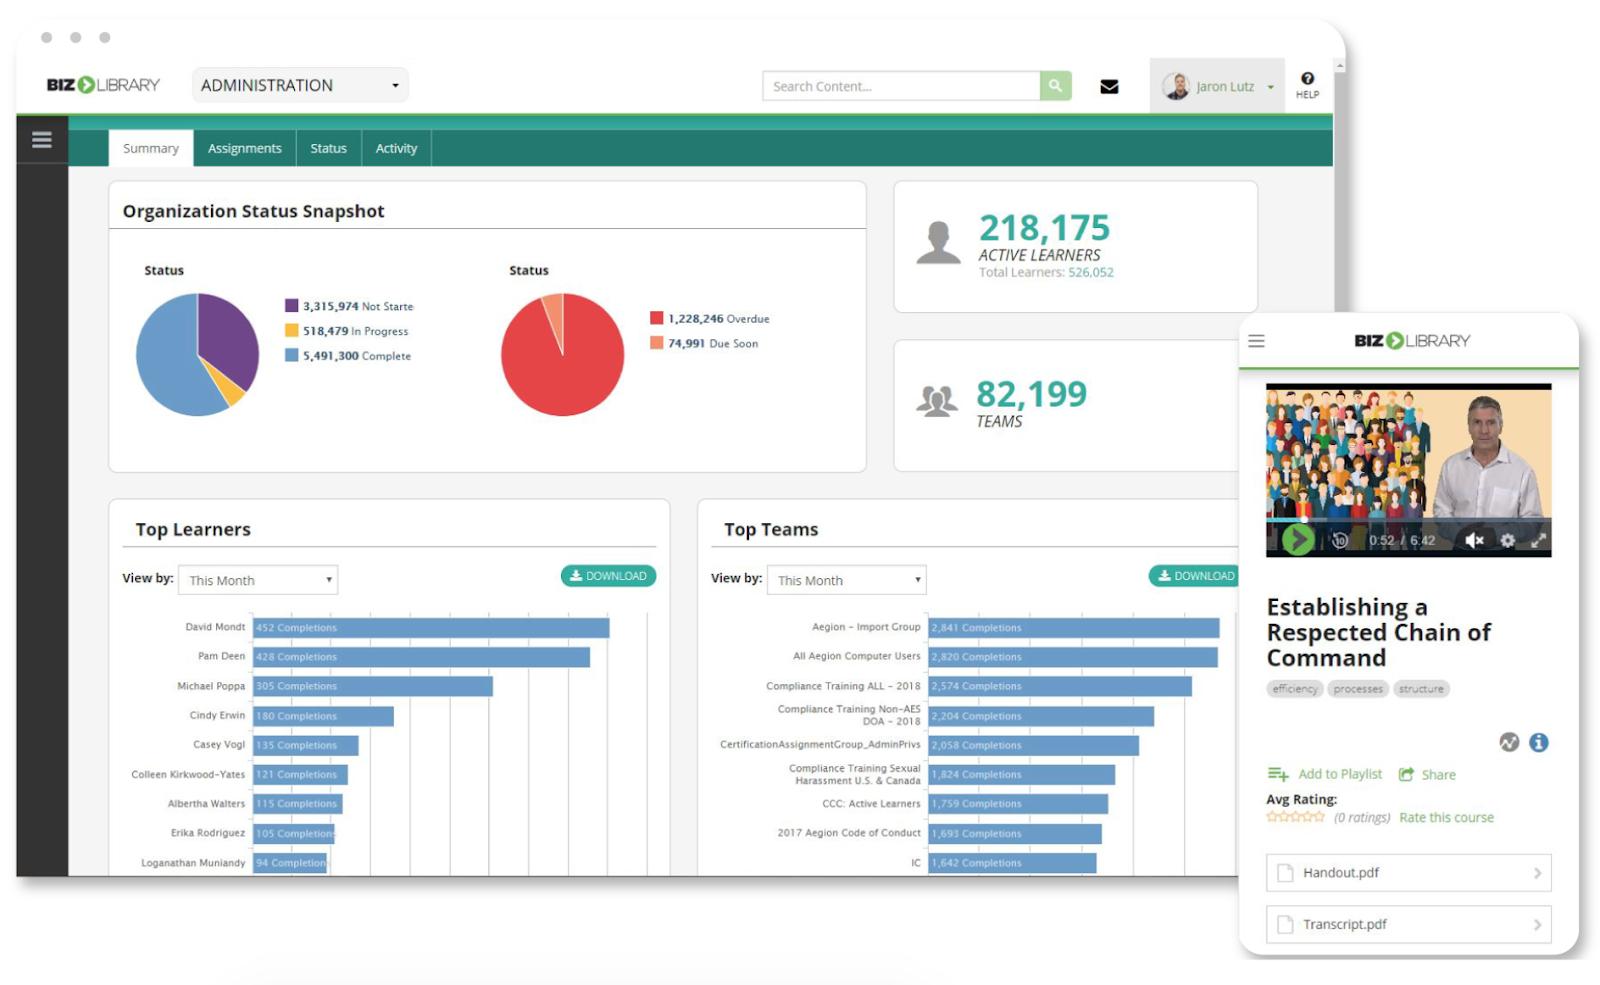 Bizlibrary software highlight internal hires